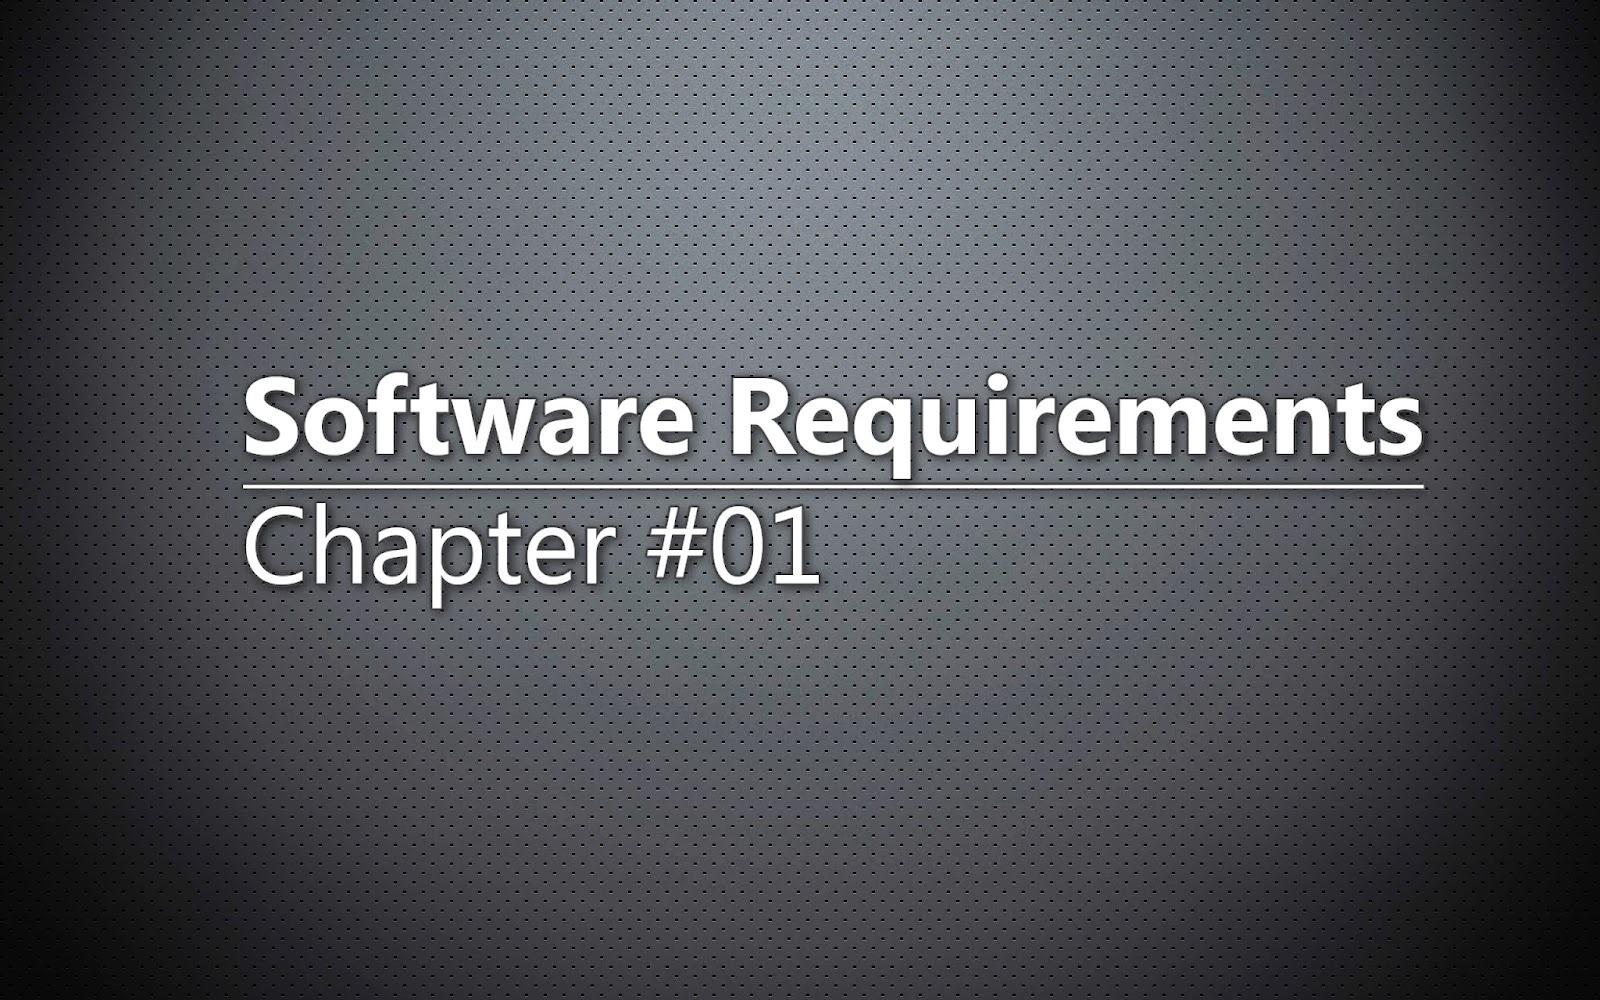 Software Requirements. Три уровня требований.